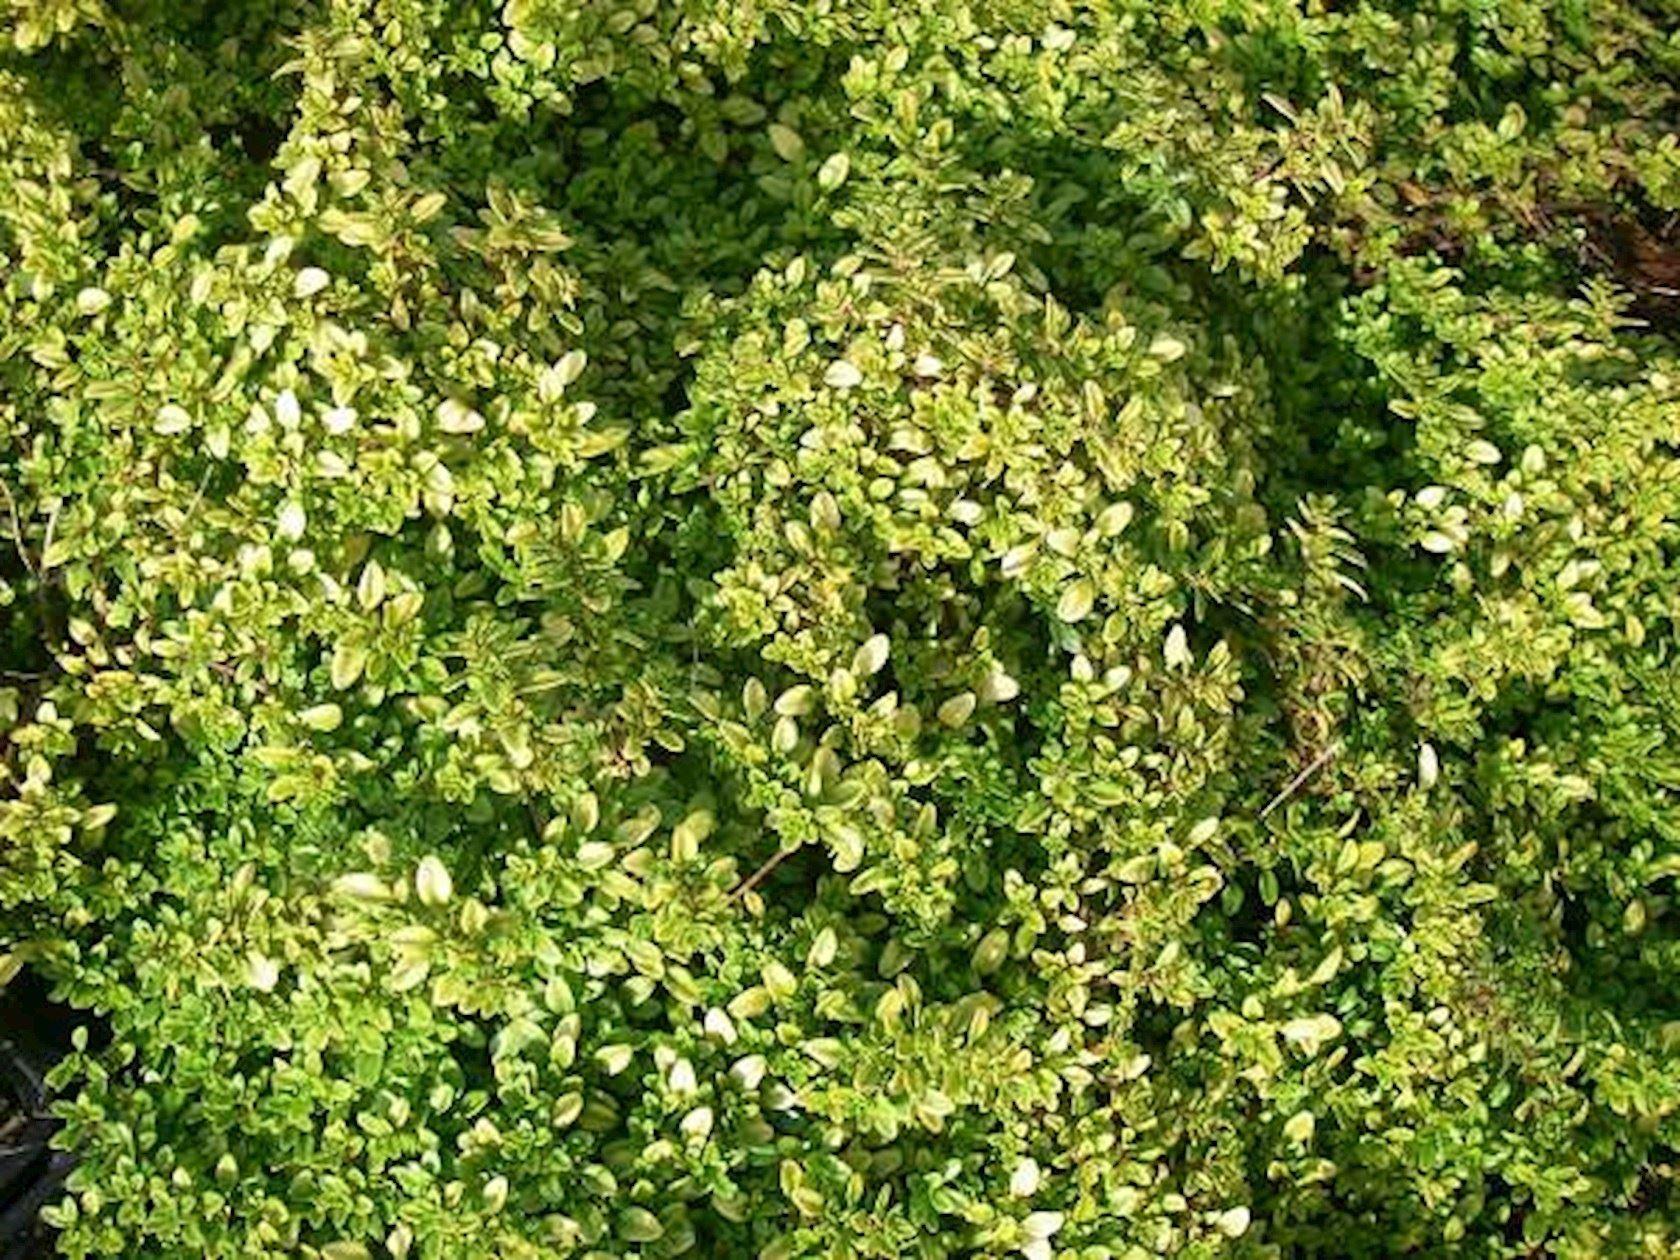 Thymus x citriodorus 'Bertram Anderson' - Citroentijm